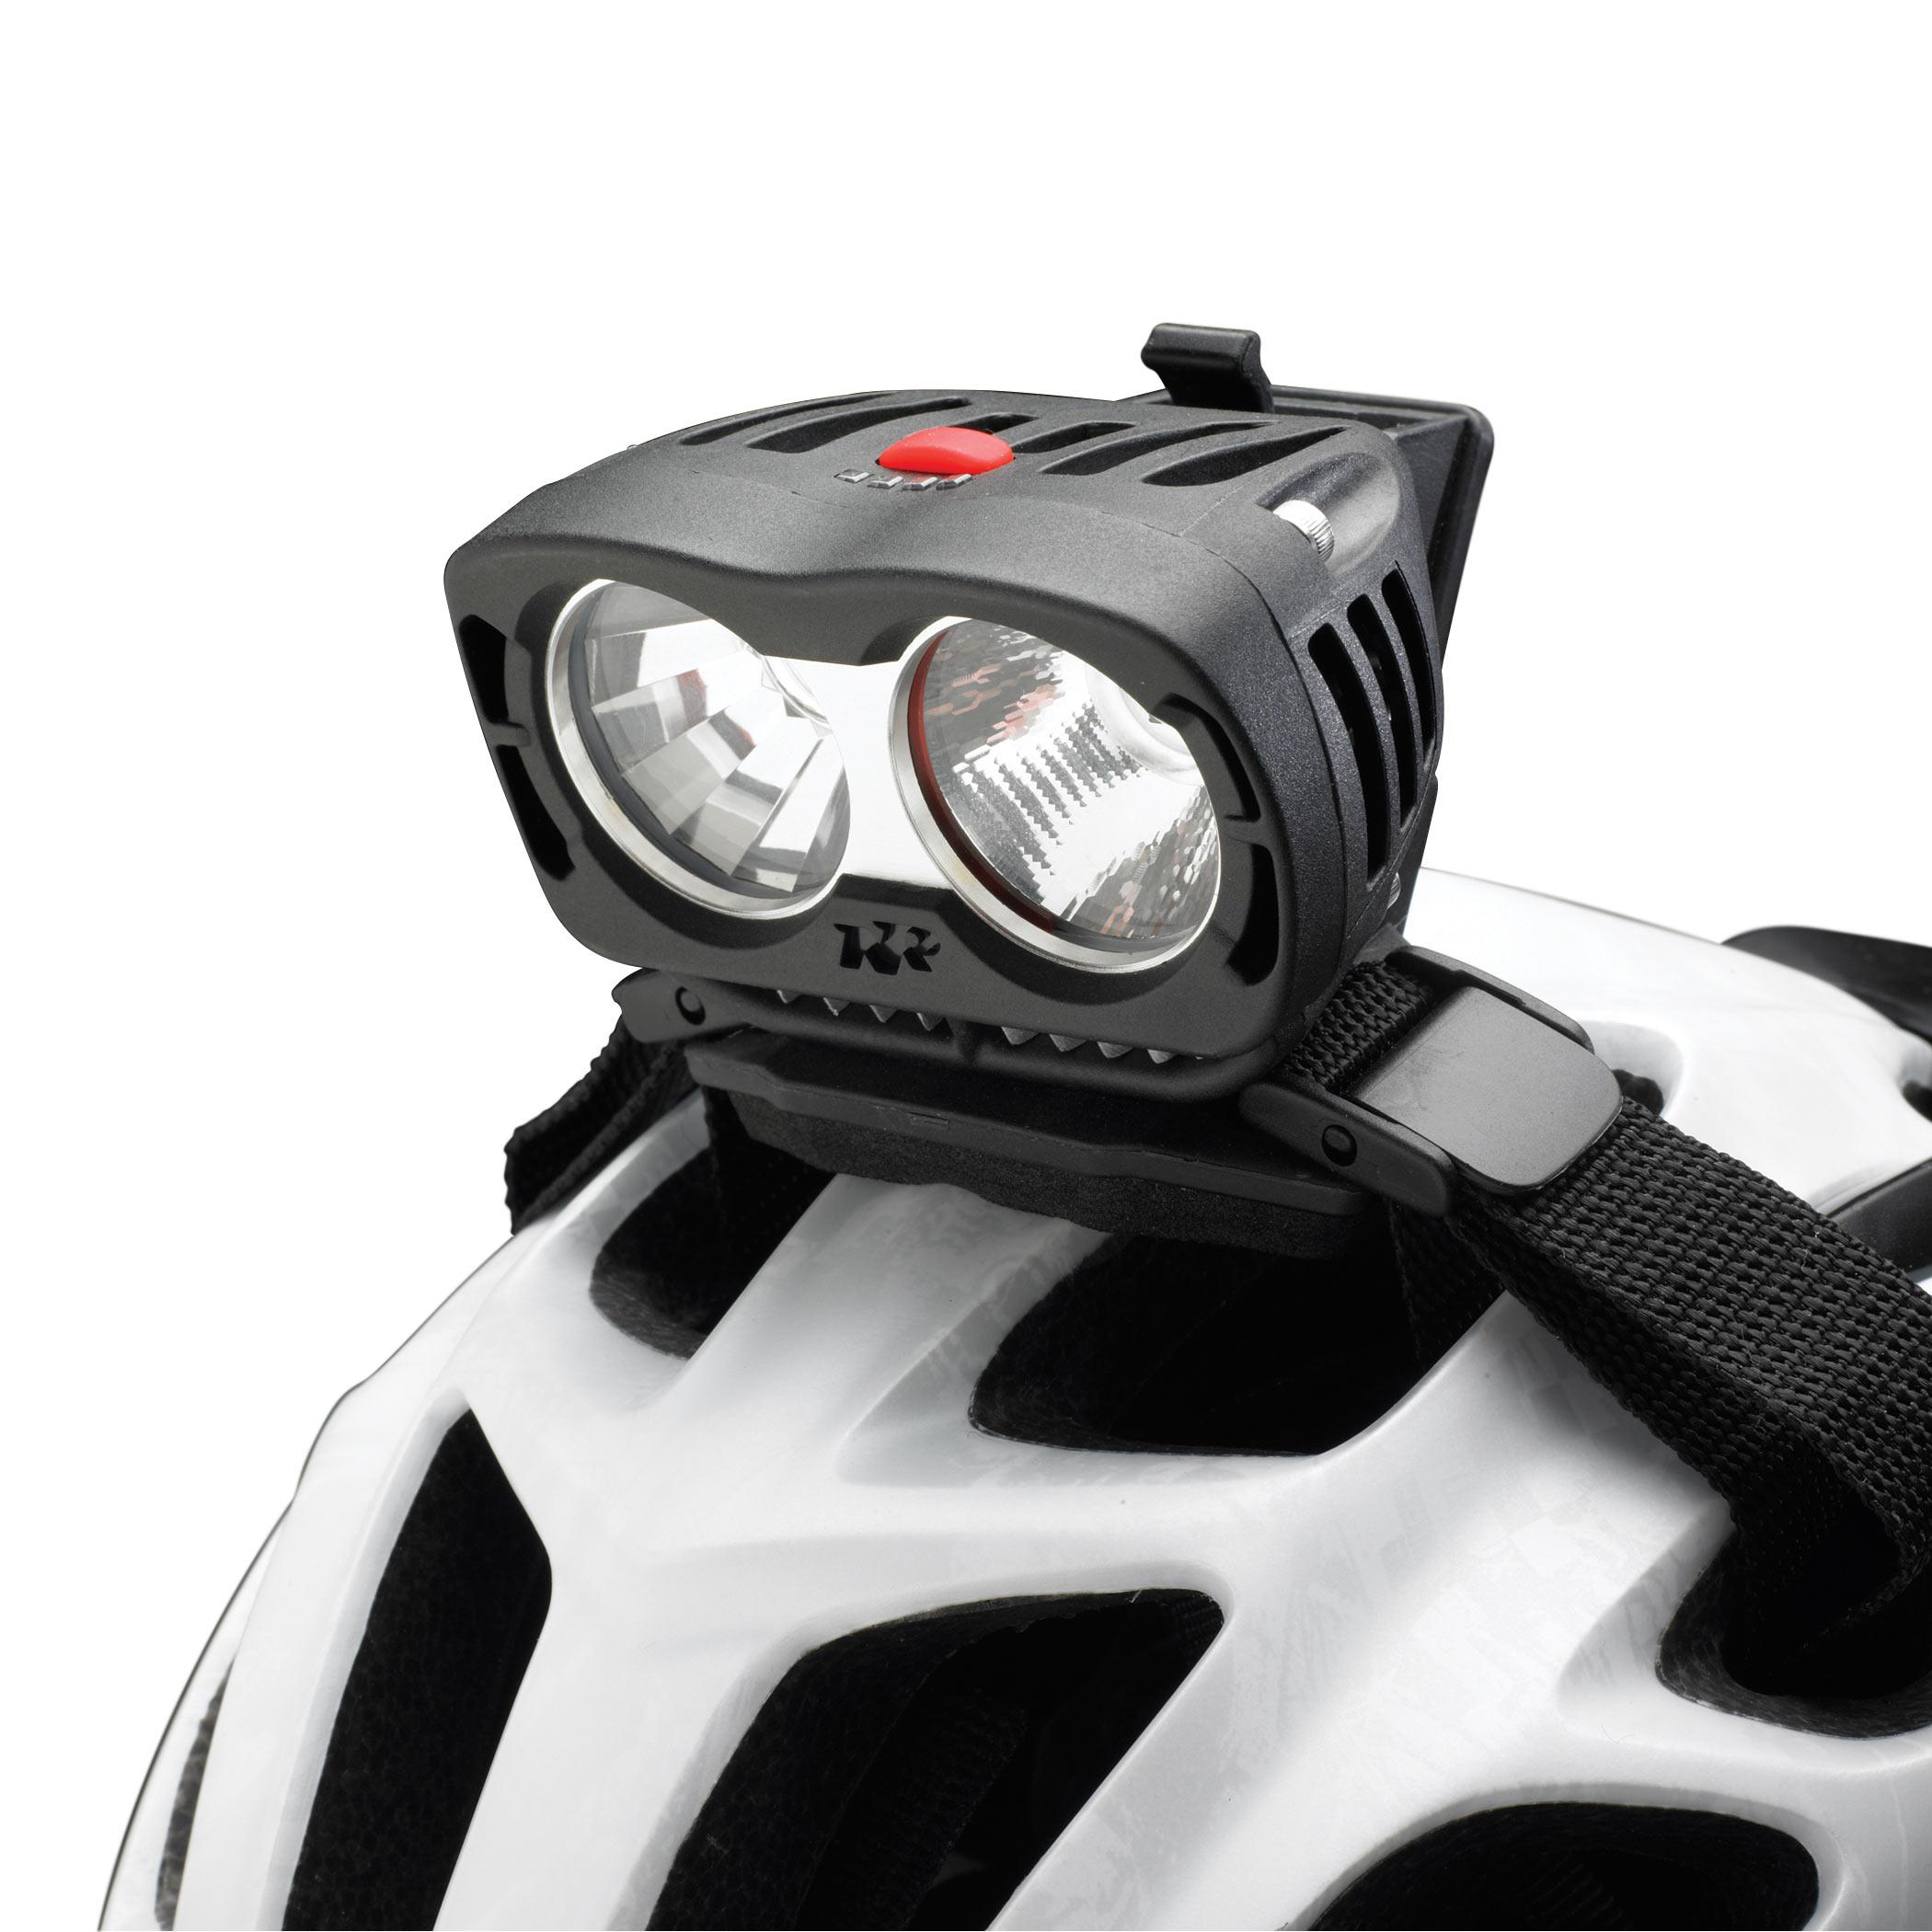 Niterider Pro 3600 Enduro Wheel World Bike Shops Road